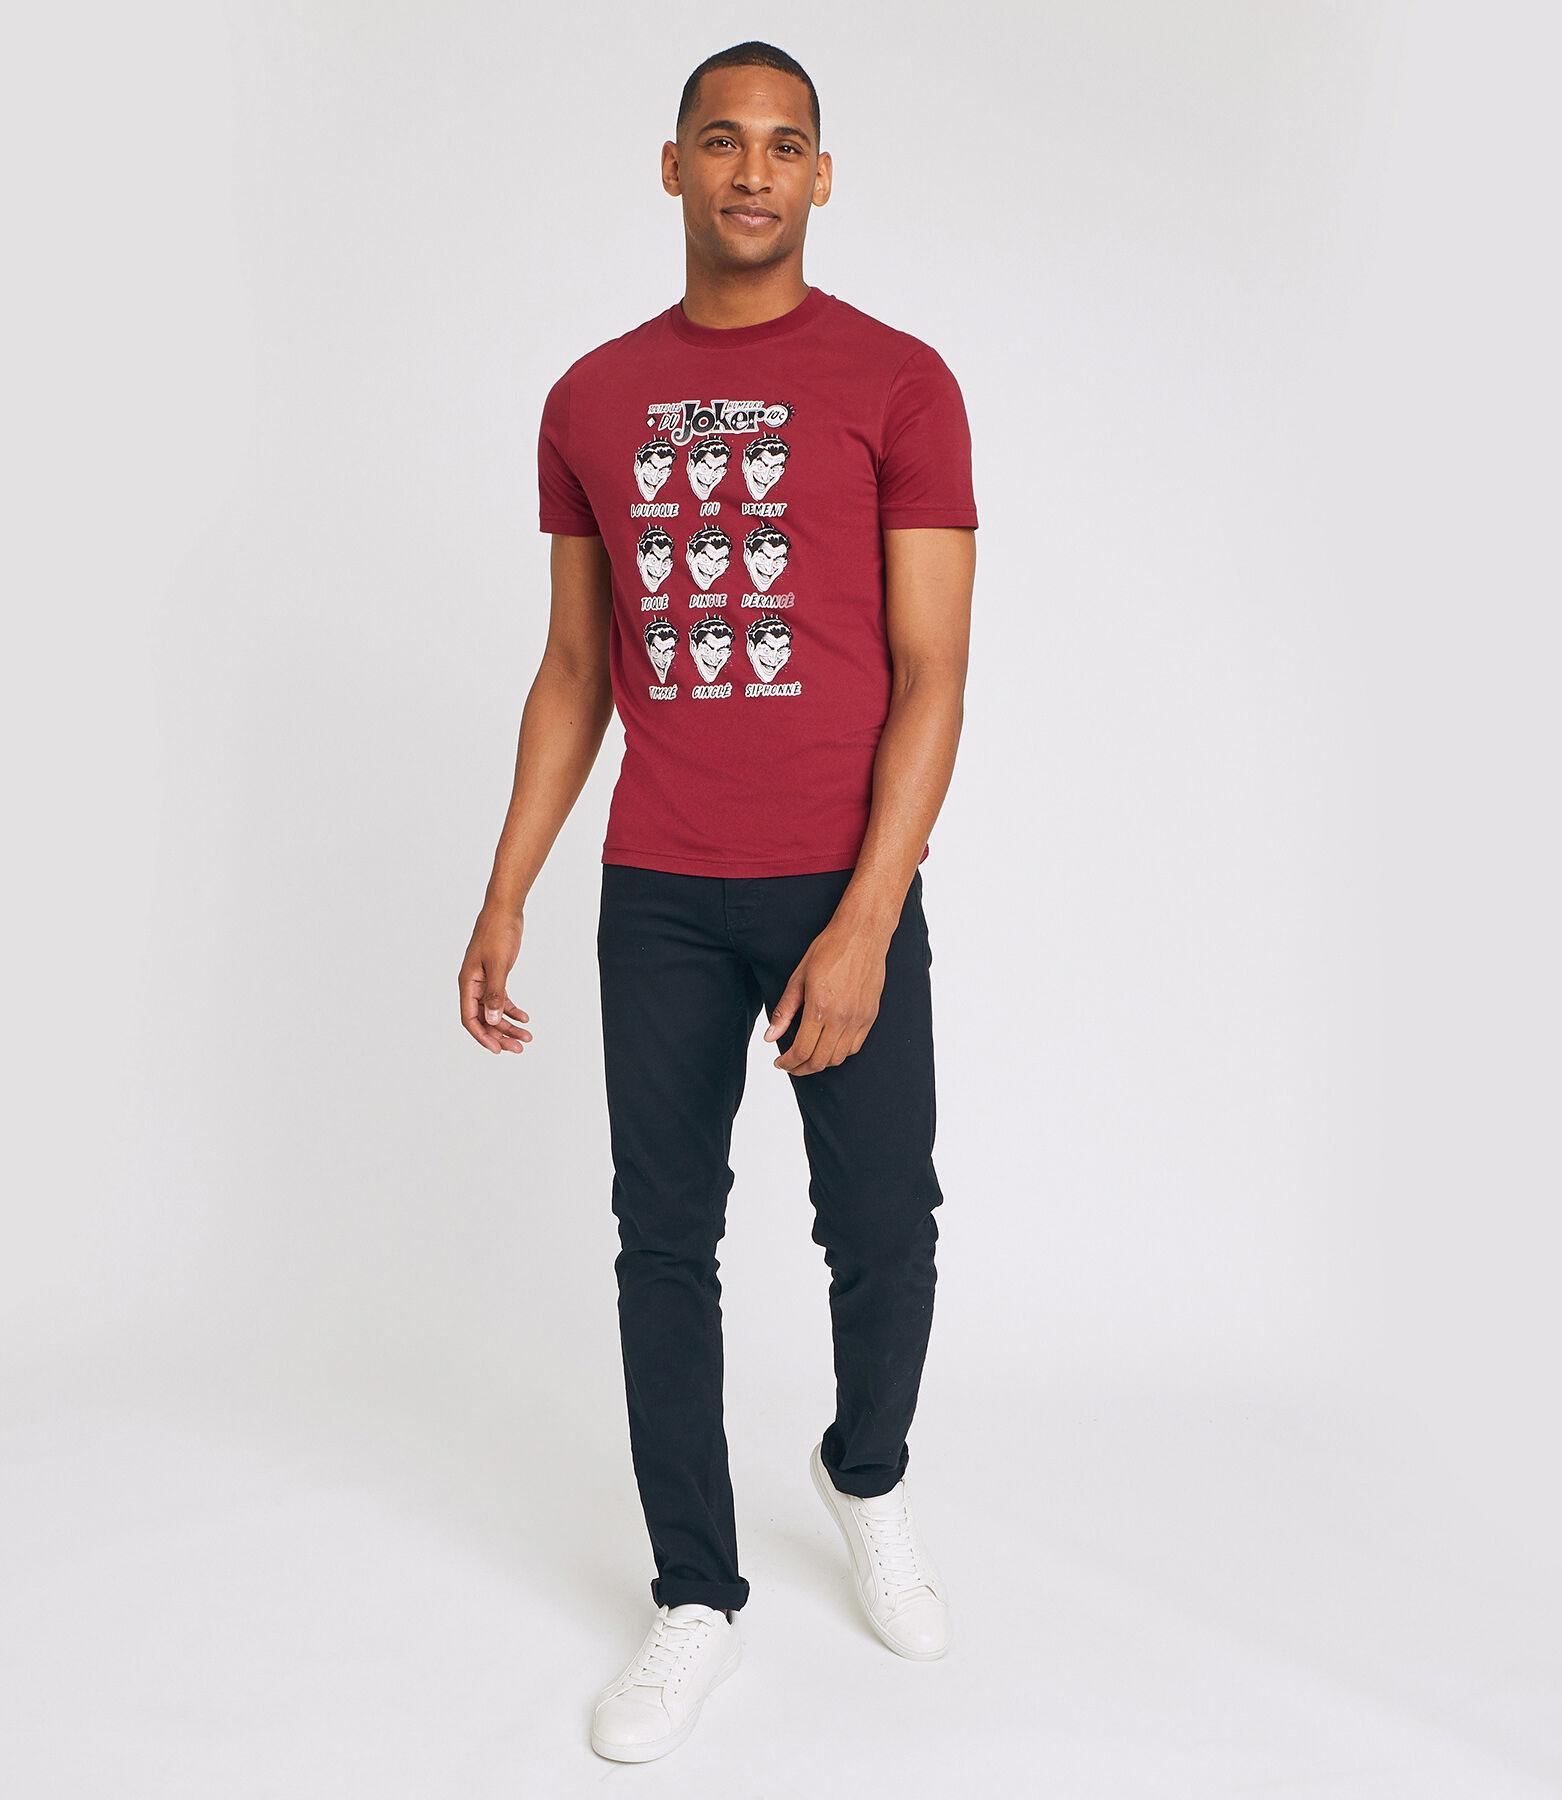 Tshirt col rond et manches courtes JOKER